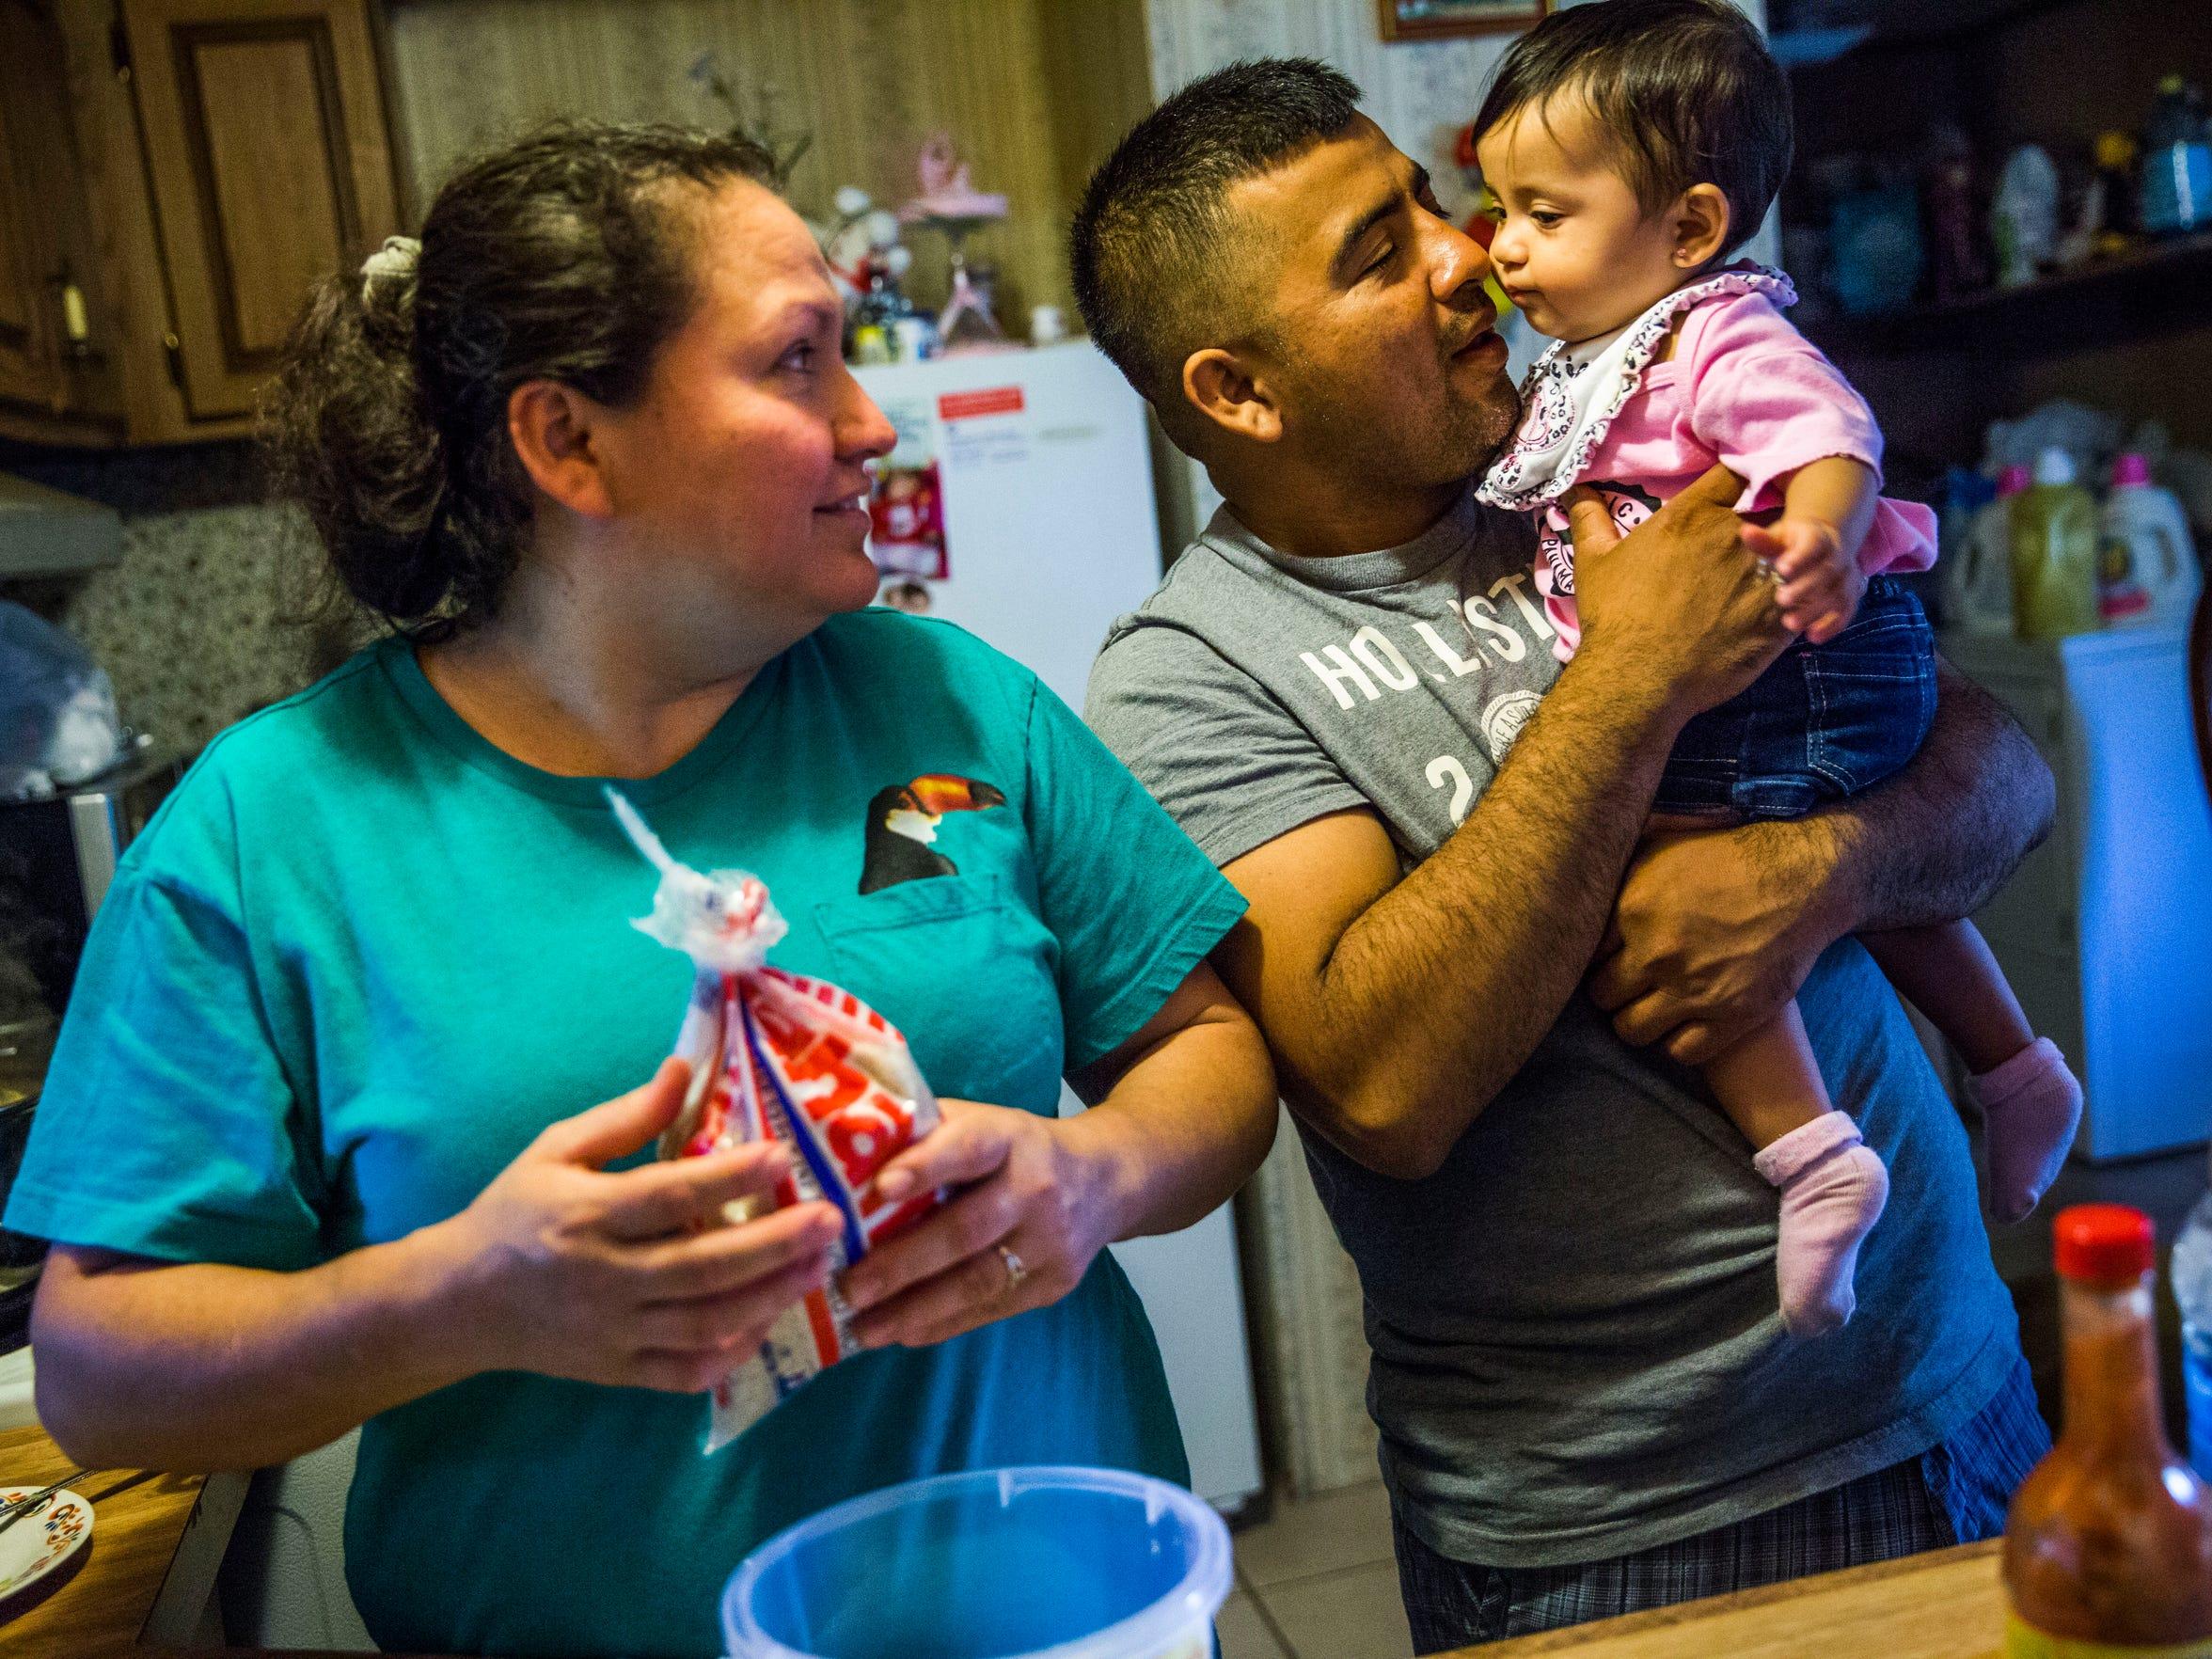 Abednego de la Cruz holds his daughter Jazlyn, 10 months old, while his partner, Blanca Menjivar, prepares dinner in their Chattahoochee, Fla., home on Saturday, July 1, 2017.